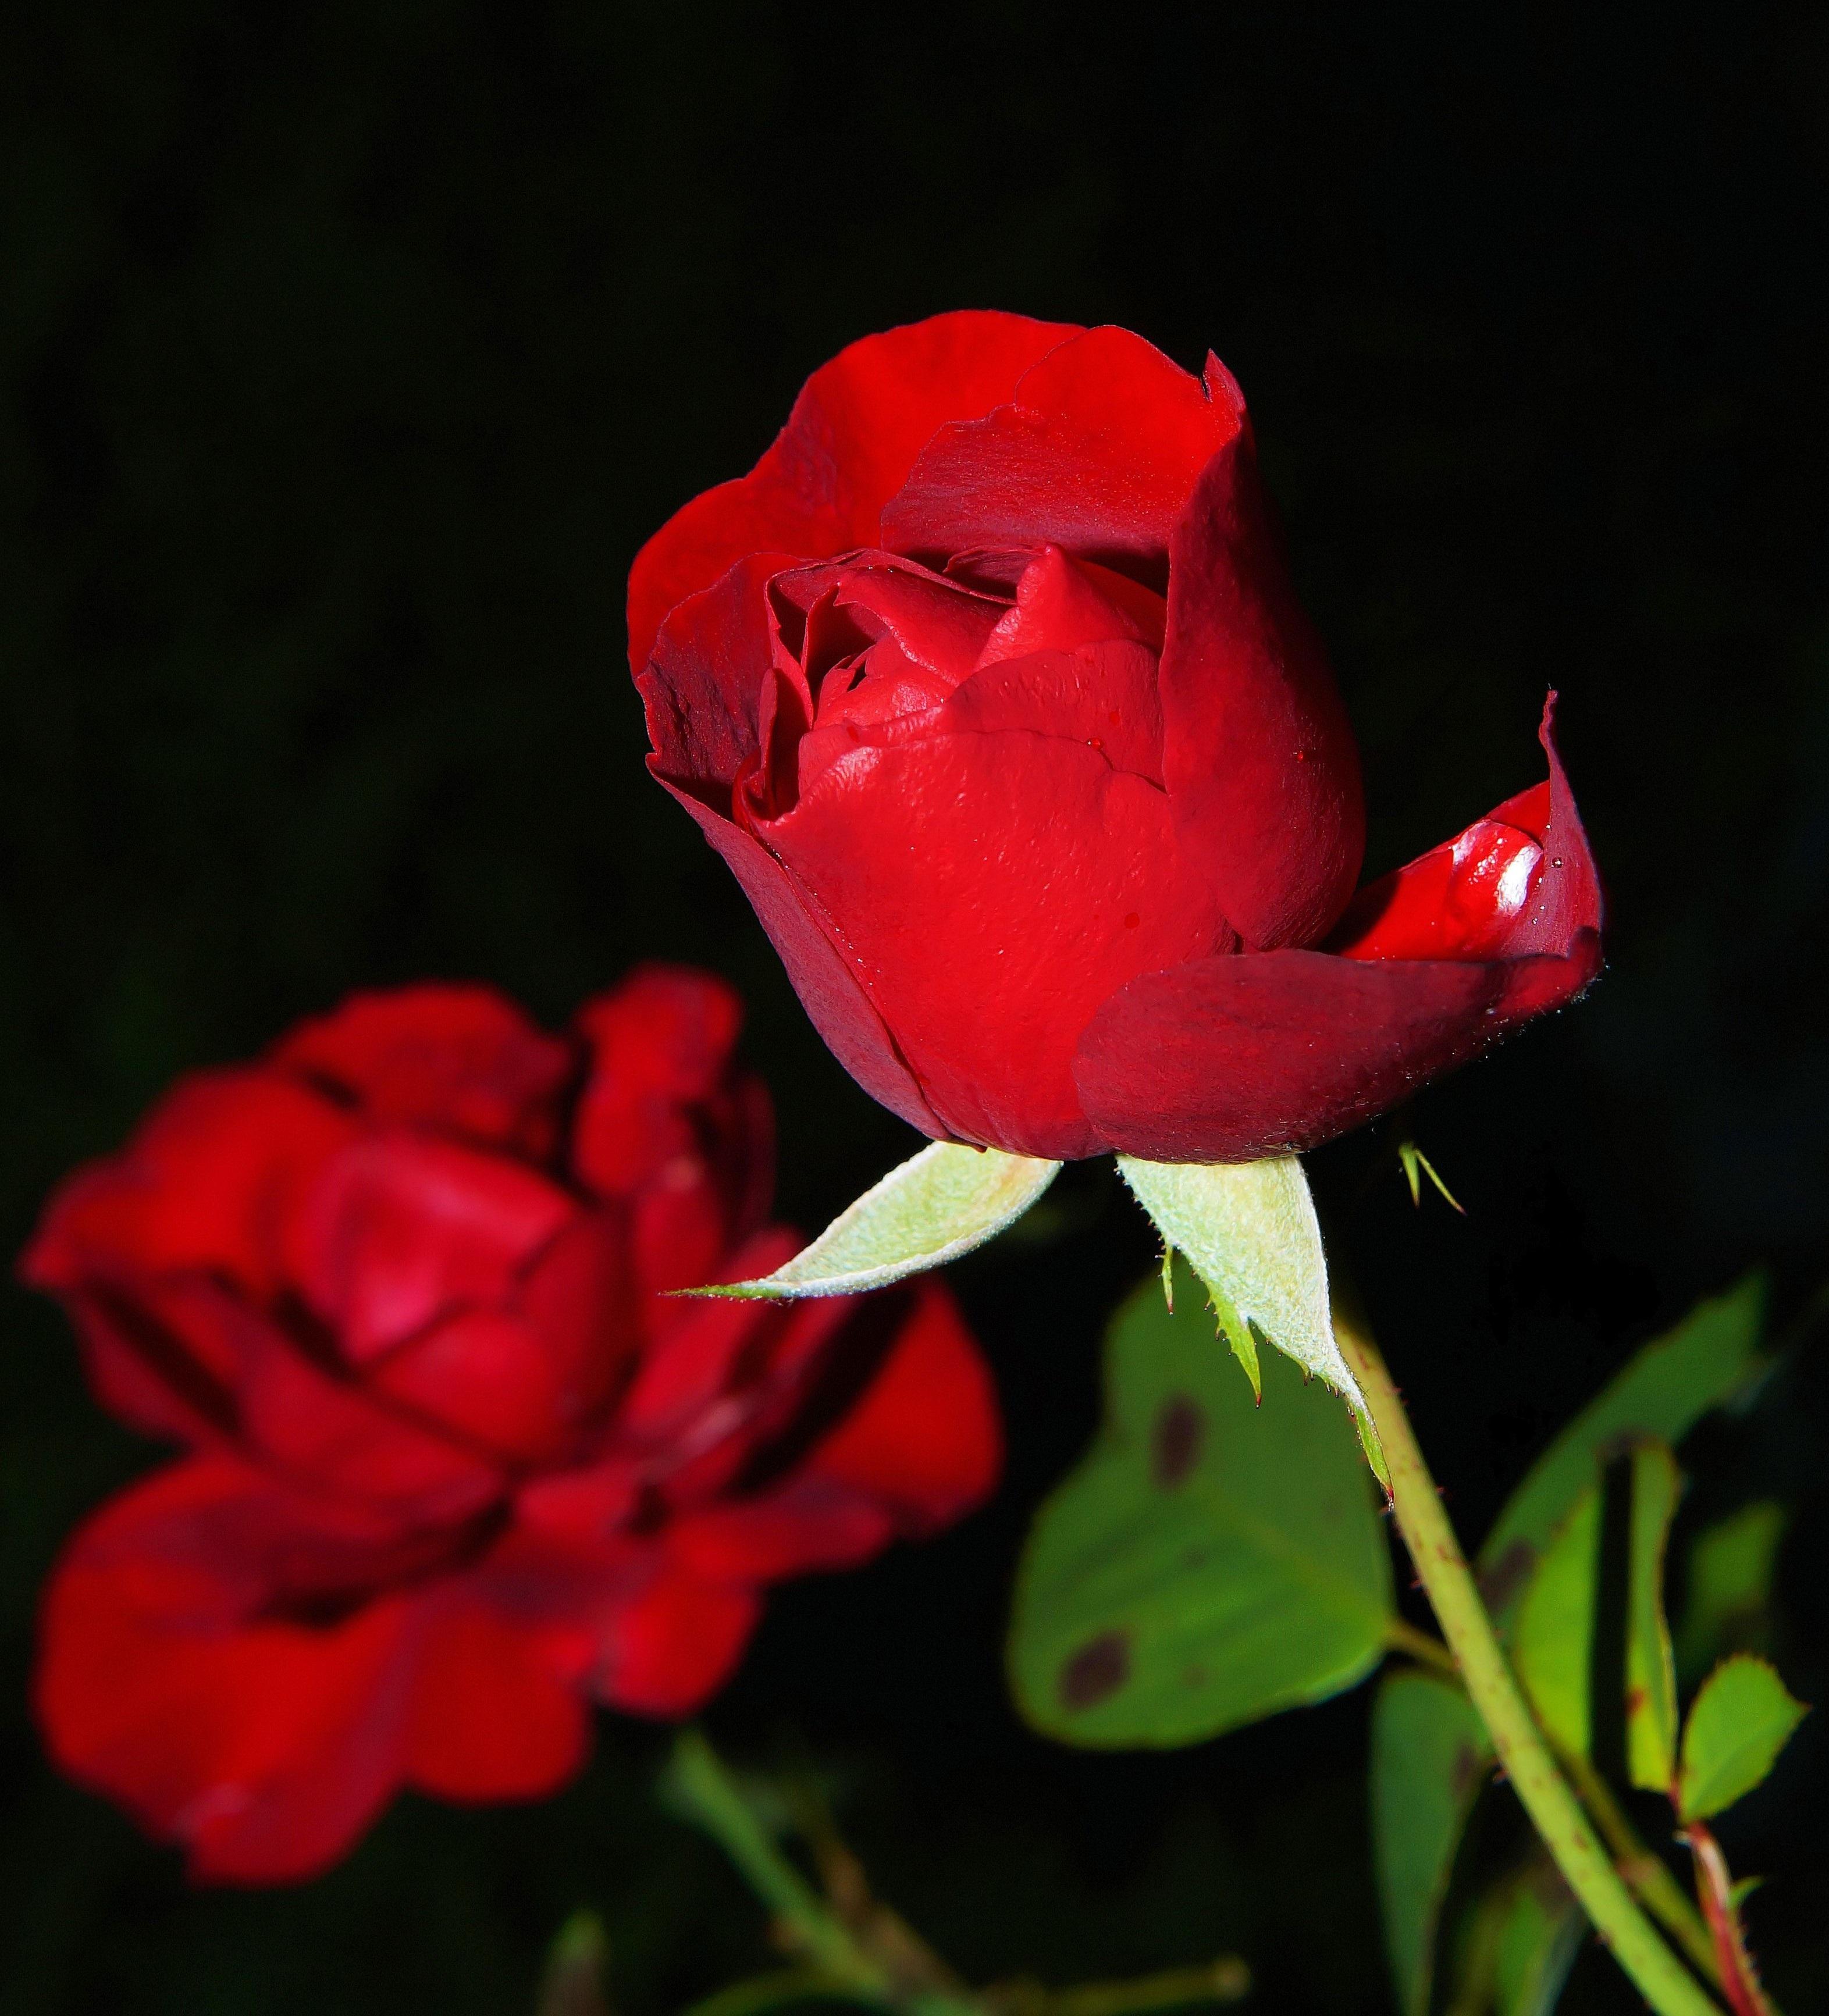 red rose free stock